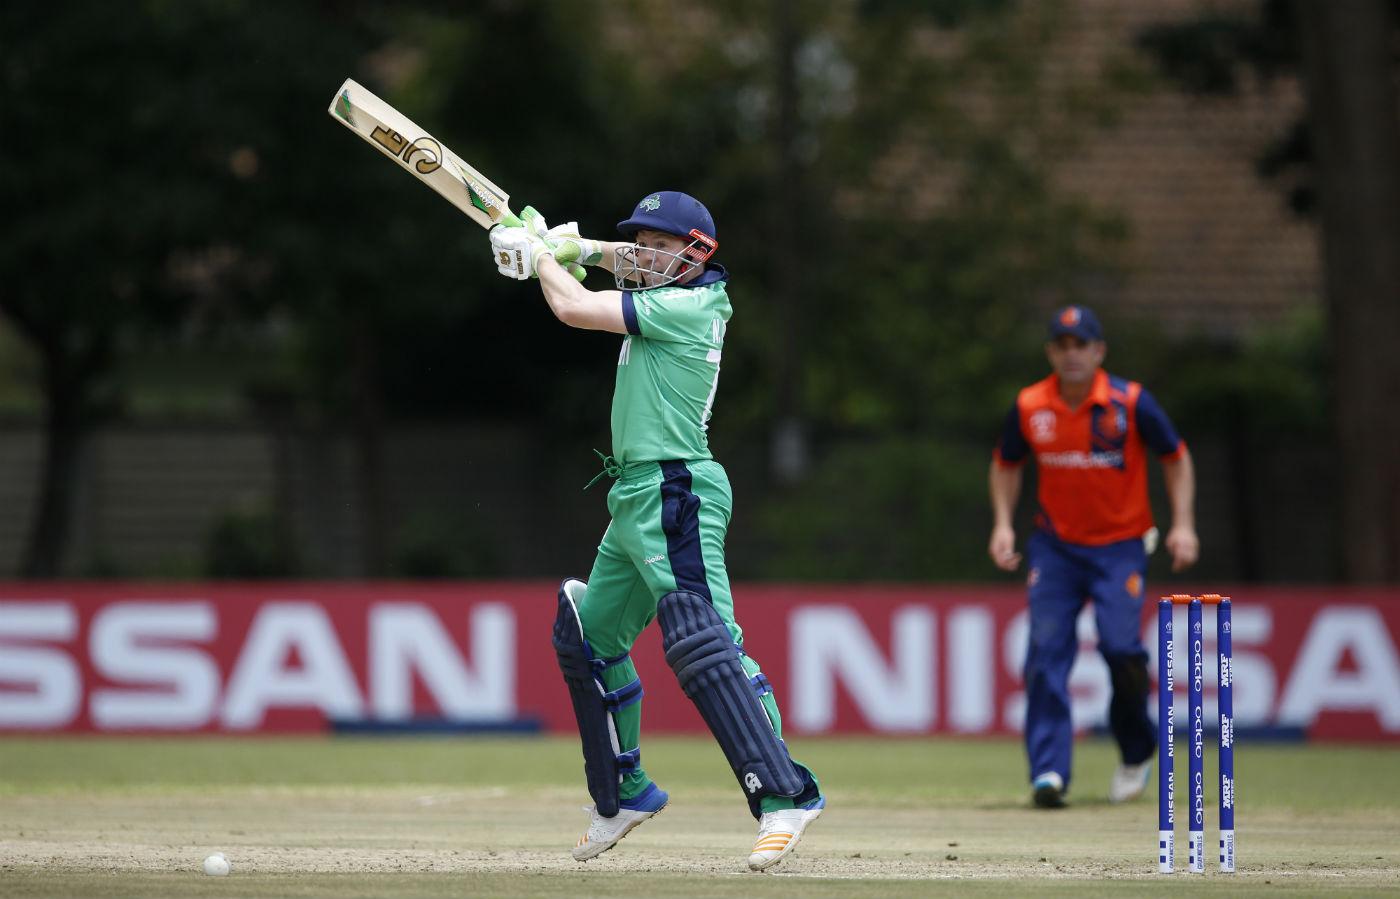 Niall O'Brien Retires From International Cricket 2